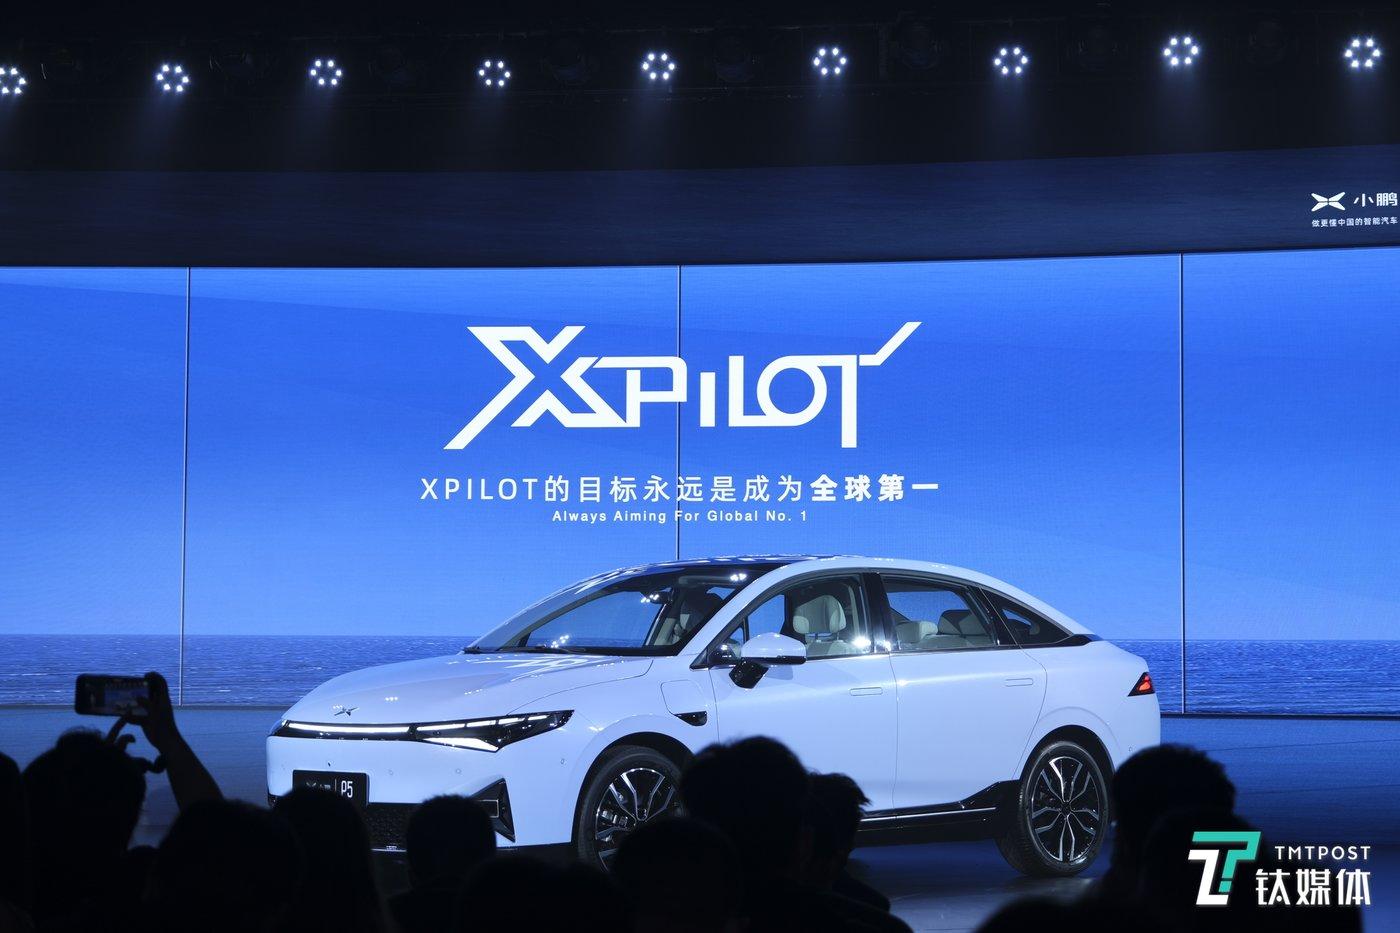 XPILOT 3.5自动驾驶辅助